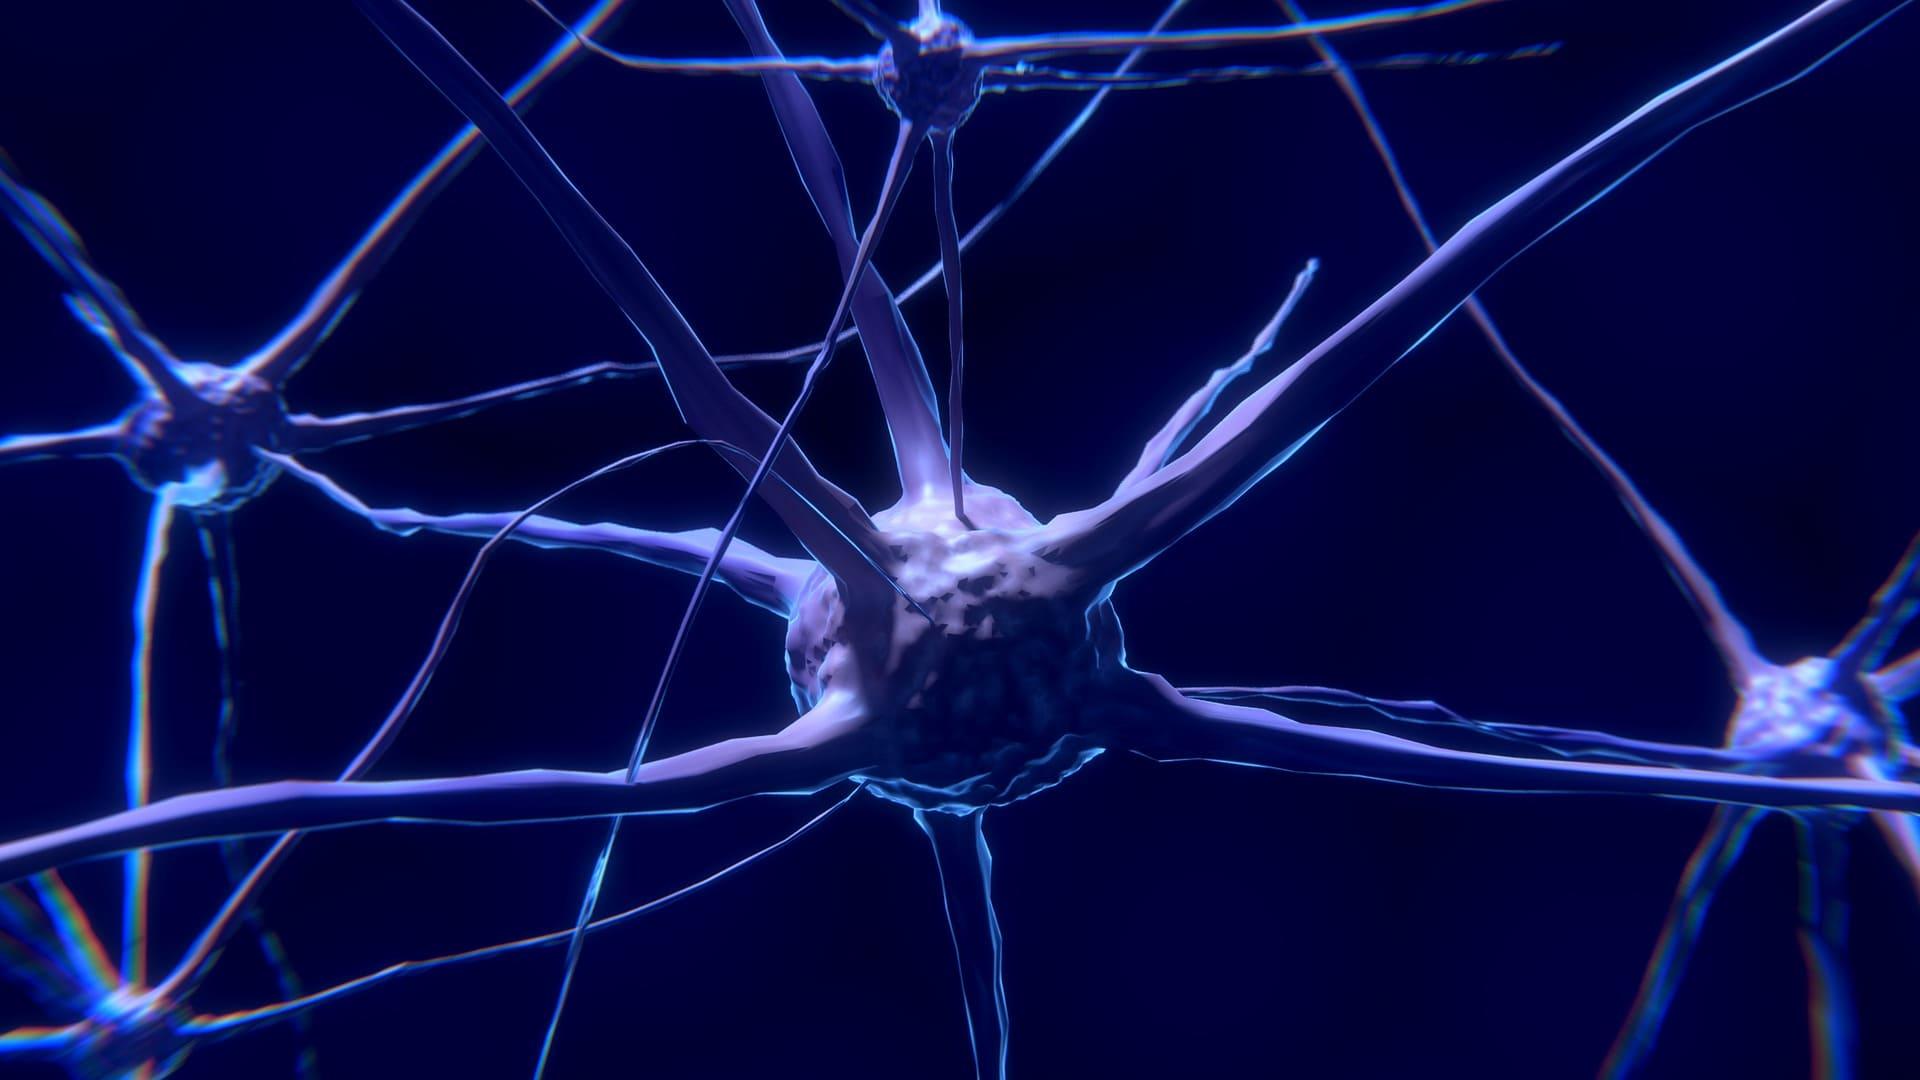 sintomi sclerosi multipla ability channel